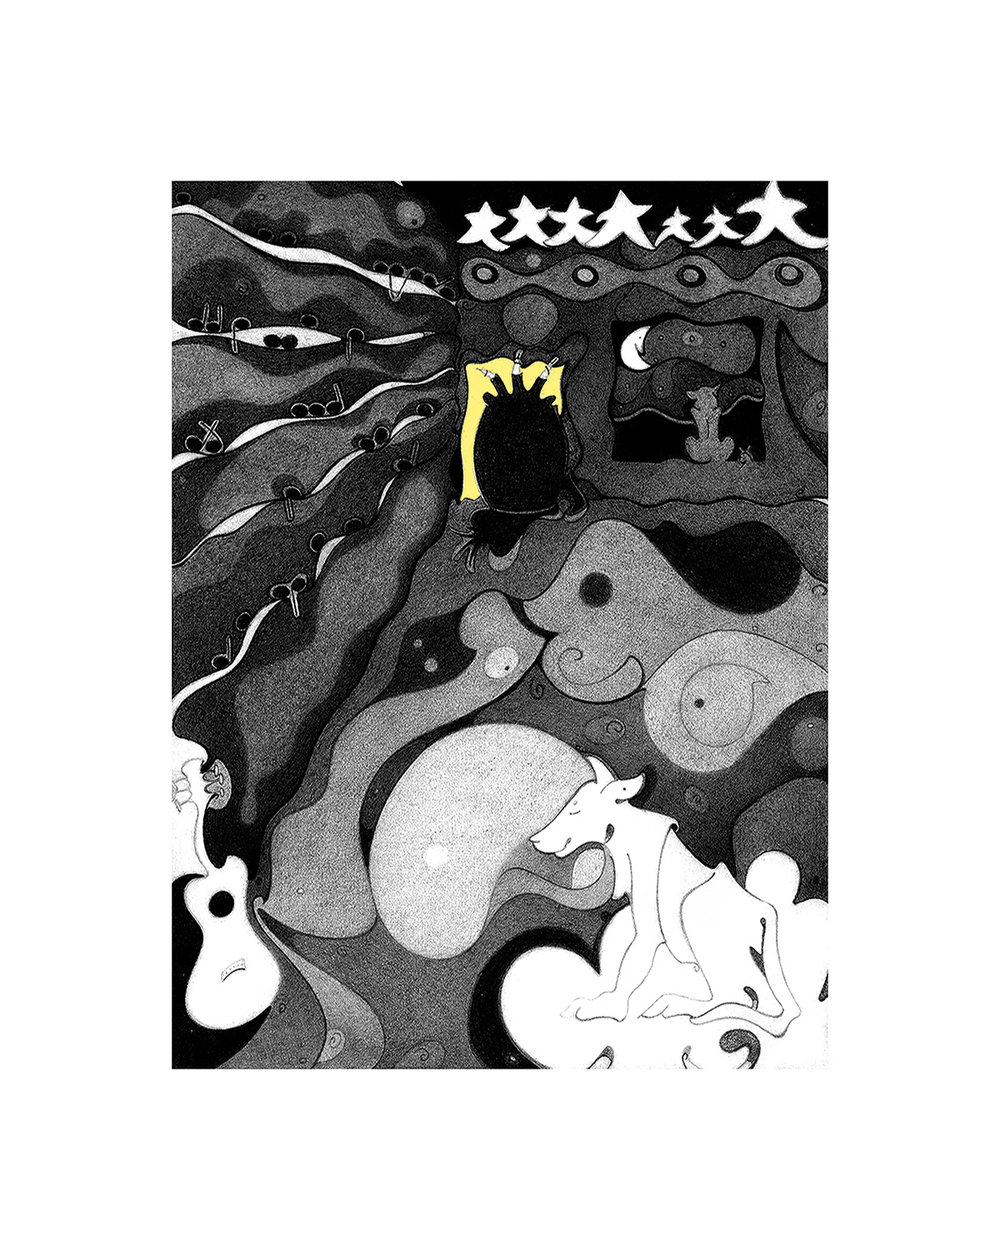 Dreamscape, digital archival, printed at Zimmerman Fine Art Studio,artwork & copyright by Kathleen Zimmerman